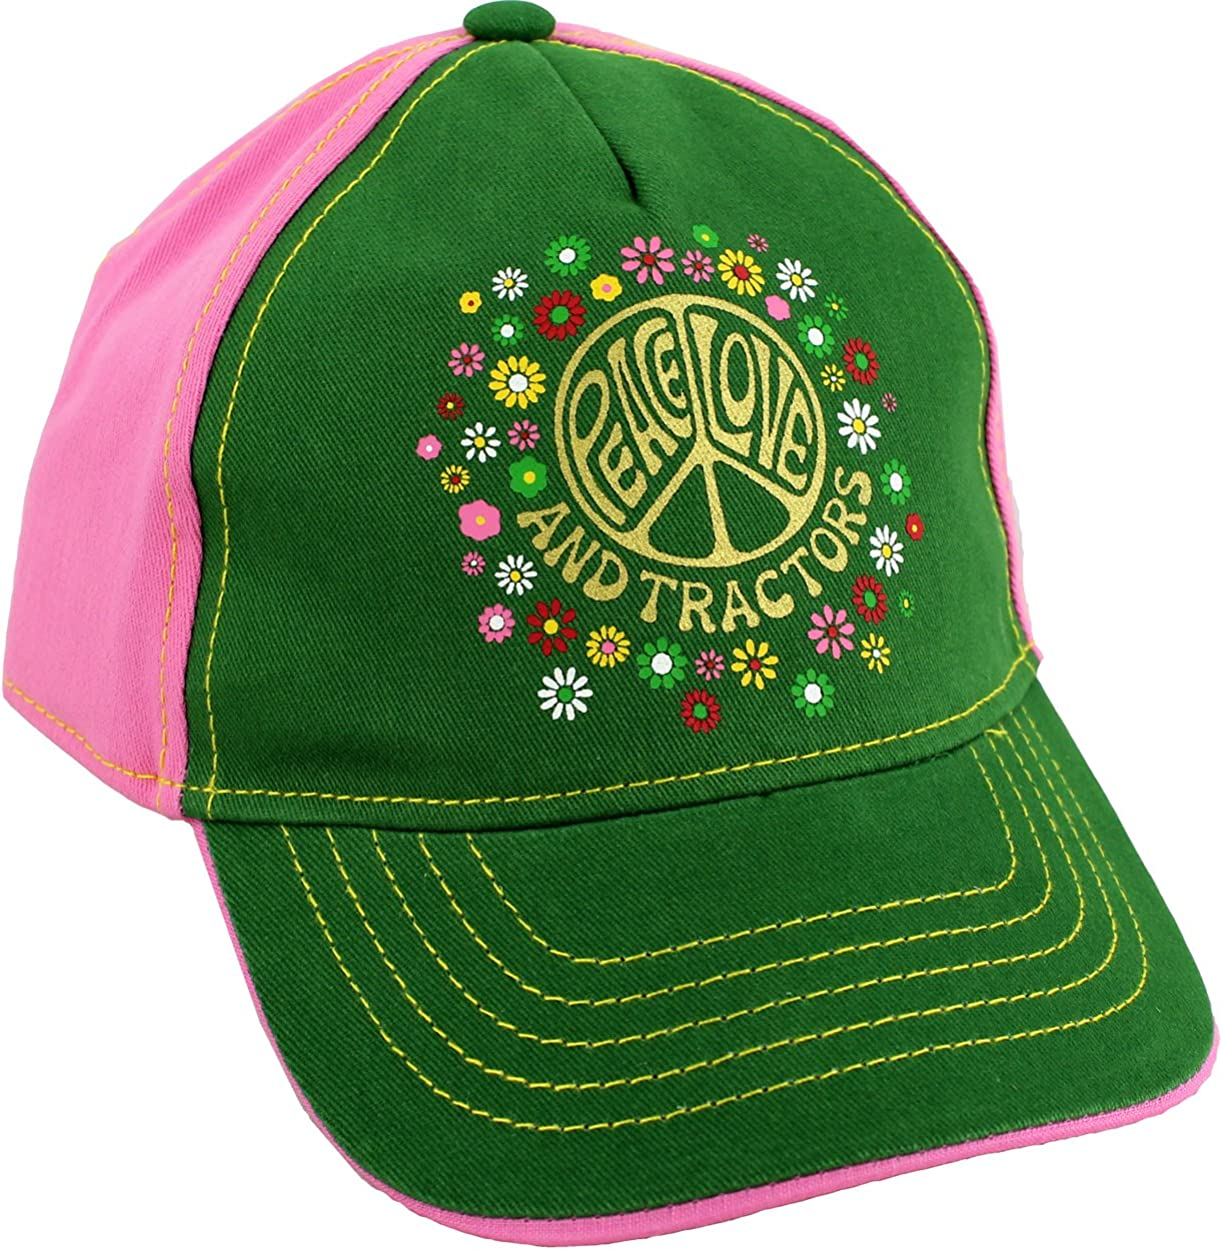 John Deere Kids Overalls And Pink Cap Children/'s Overall Gift Package